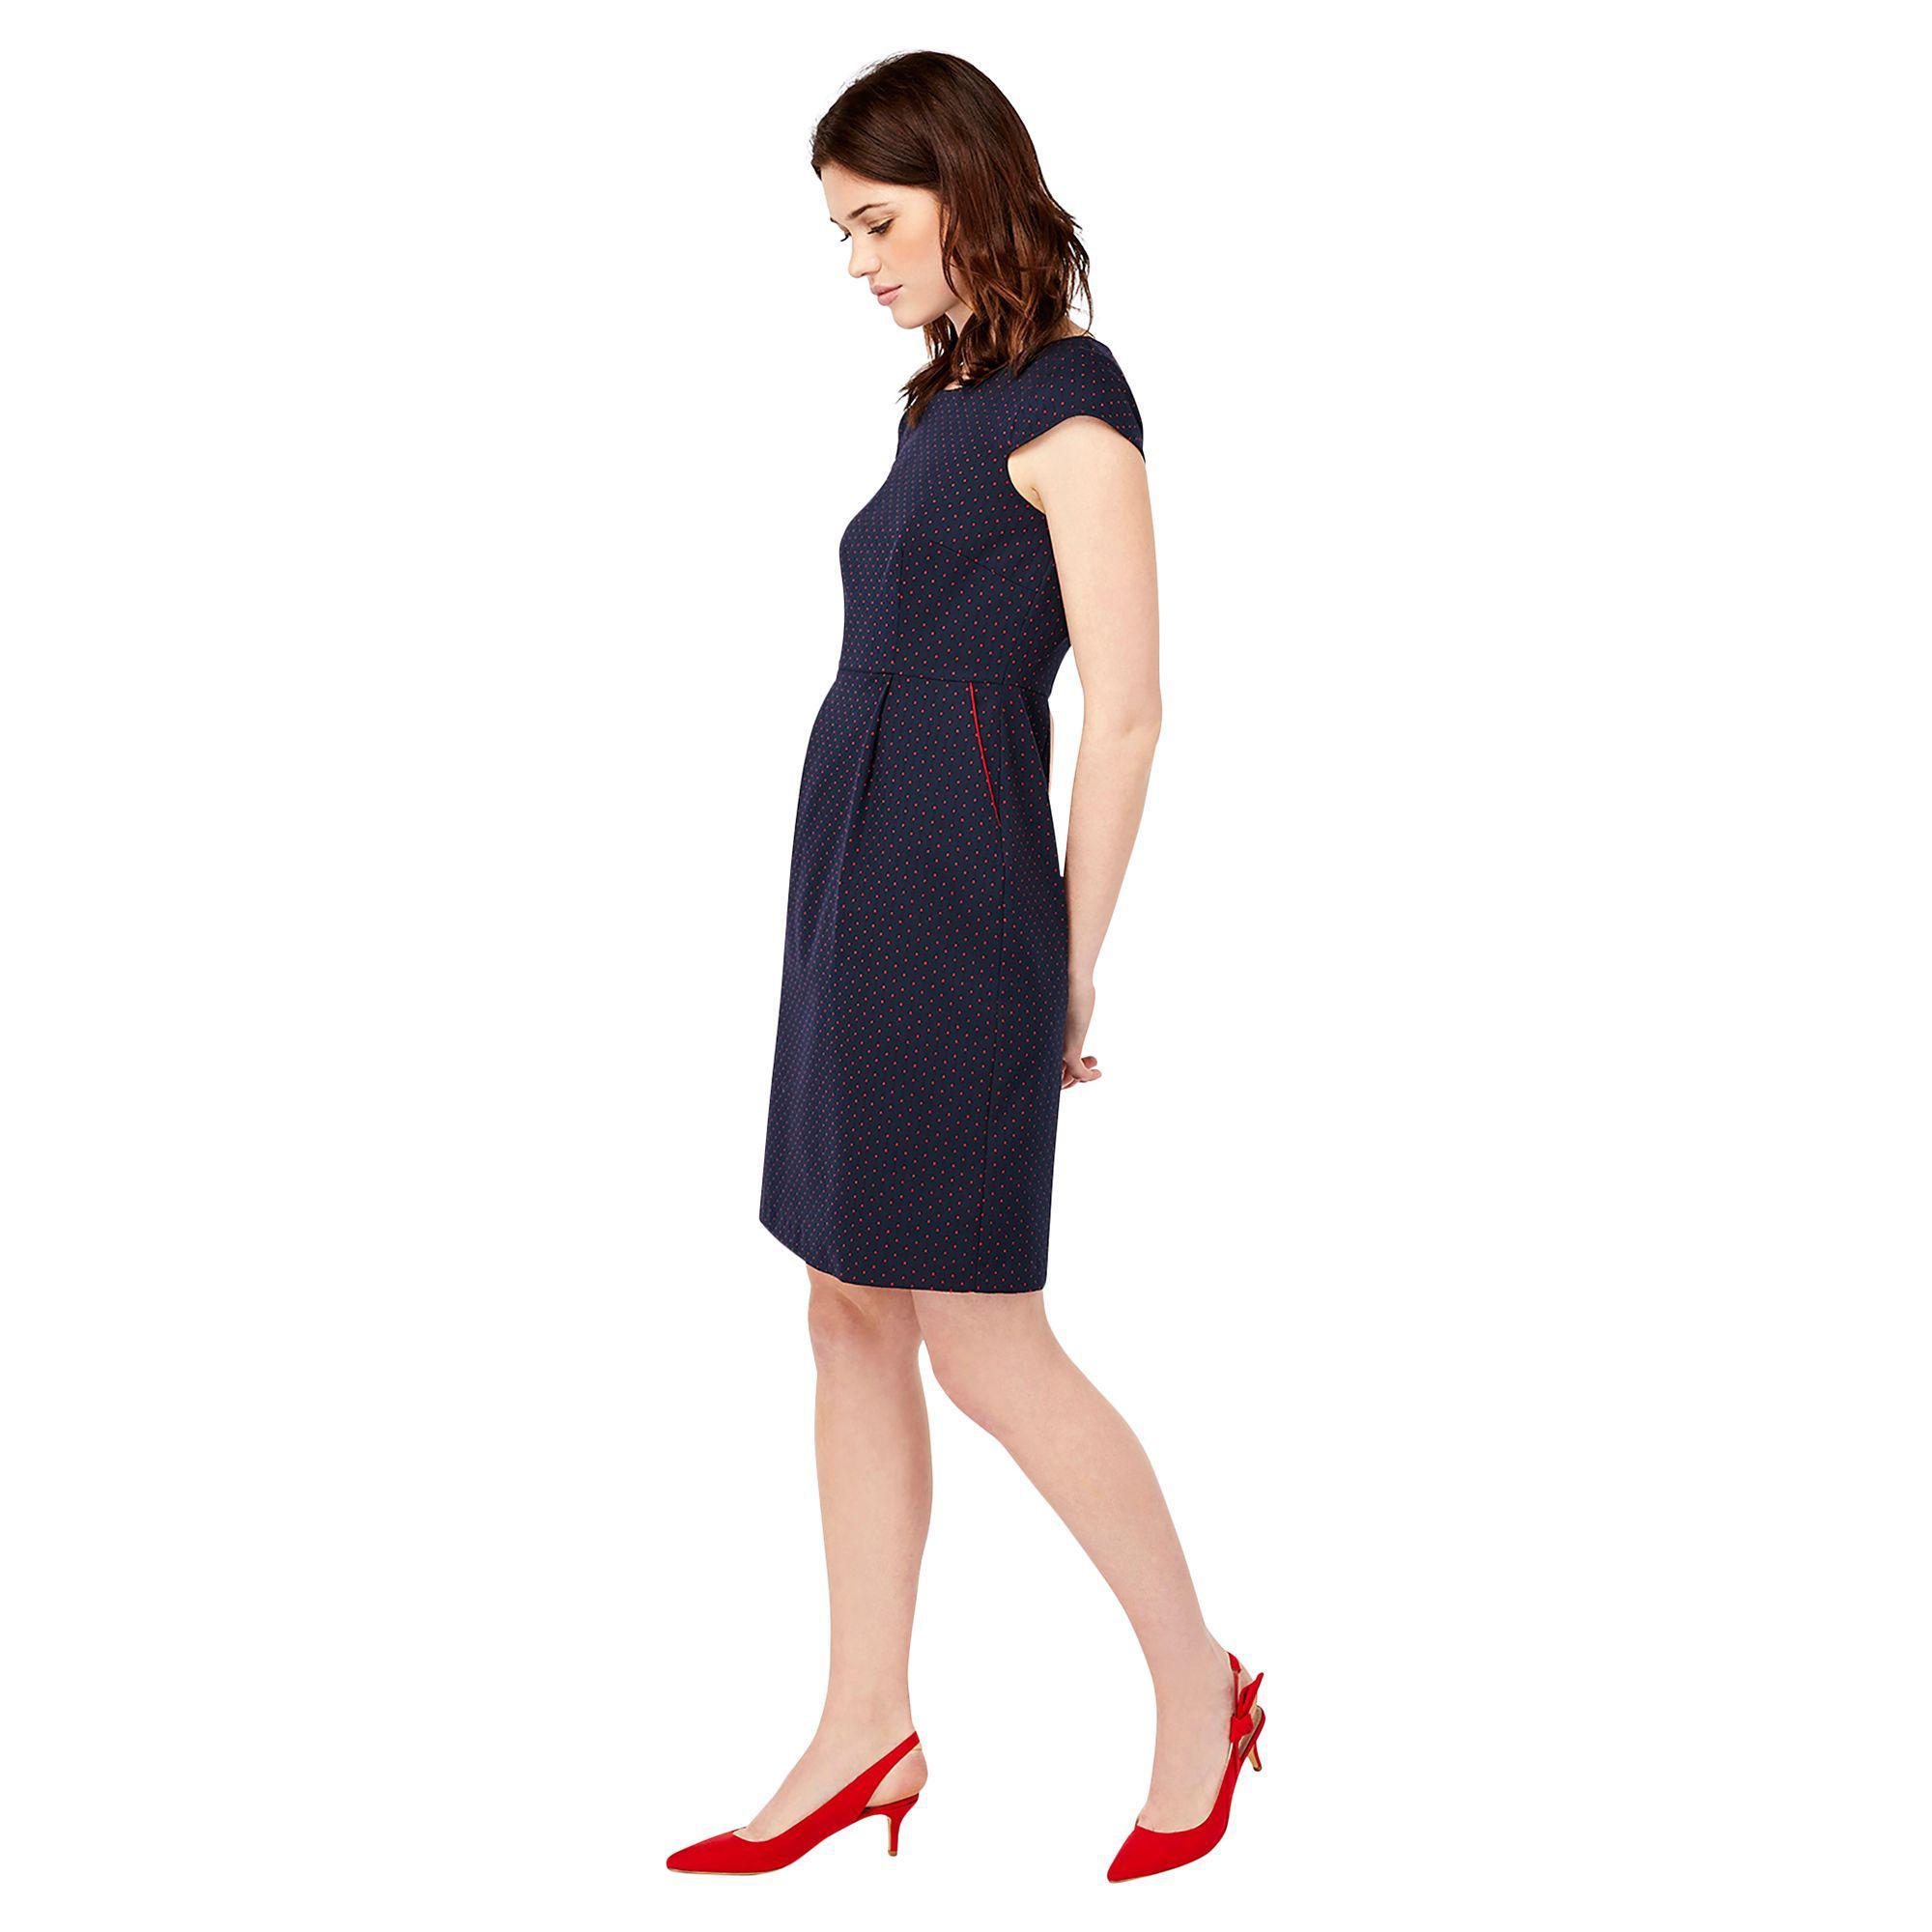 ef3342cbbb93 Monsoon Blue 'cecile' Jacquard Dress in Blue - Lyst